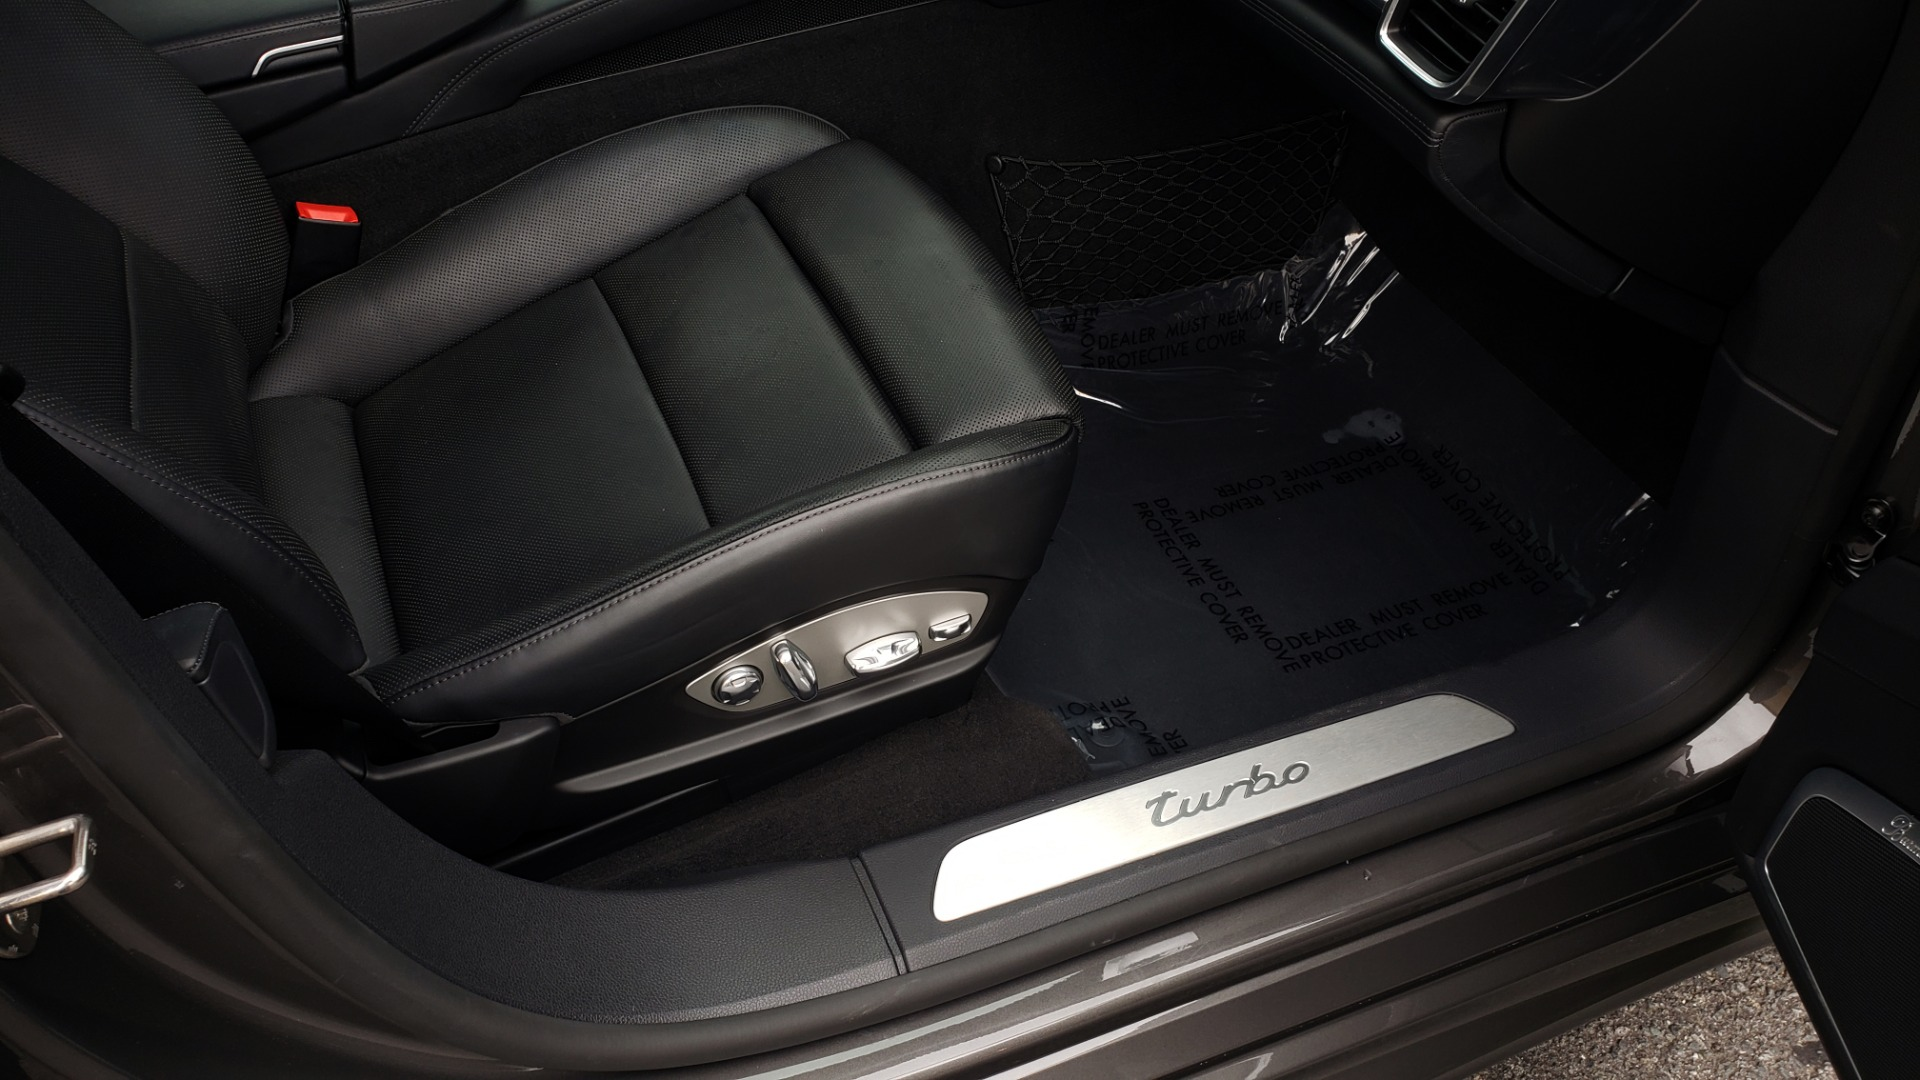 Used 2013 Porsche PANAMERA TURBO 4.8L V8 / AWD / NAV / SUNROOF / LCA / PARK ASST / BURMESTER for sale $45,995 at Formula Imports in Charlotte NC 28227 71